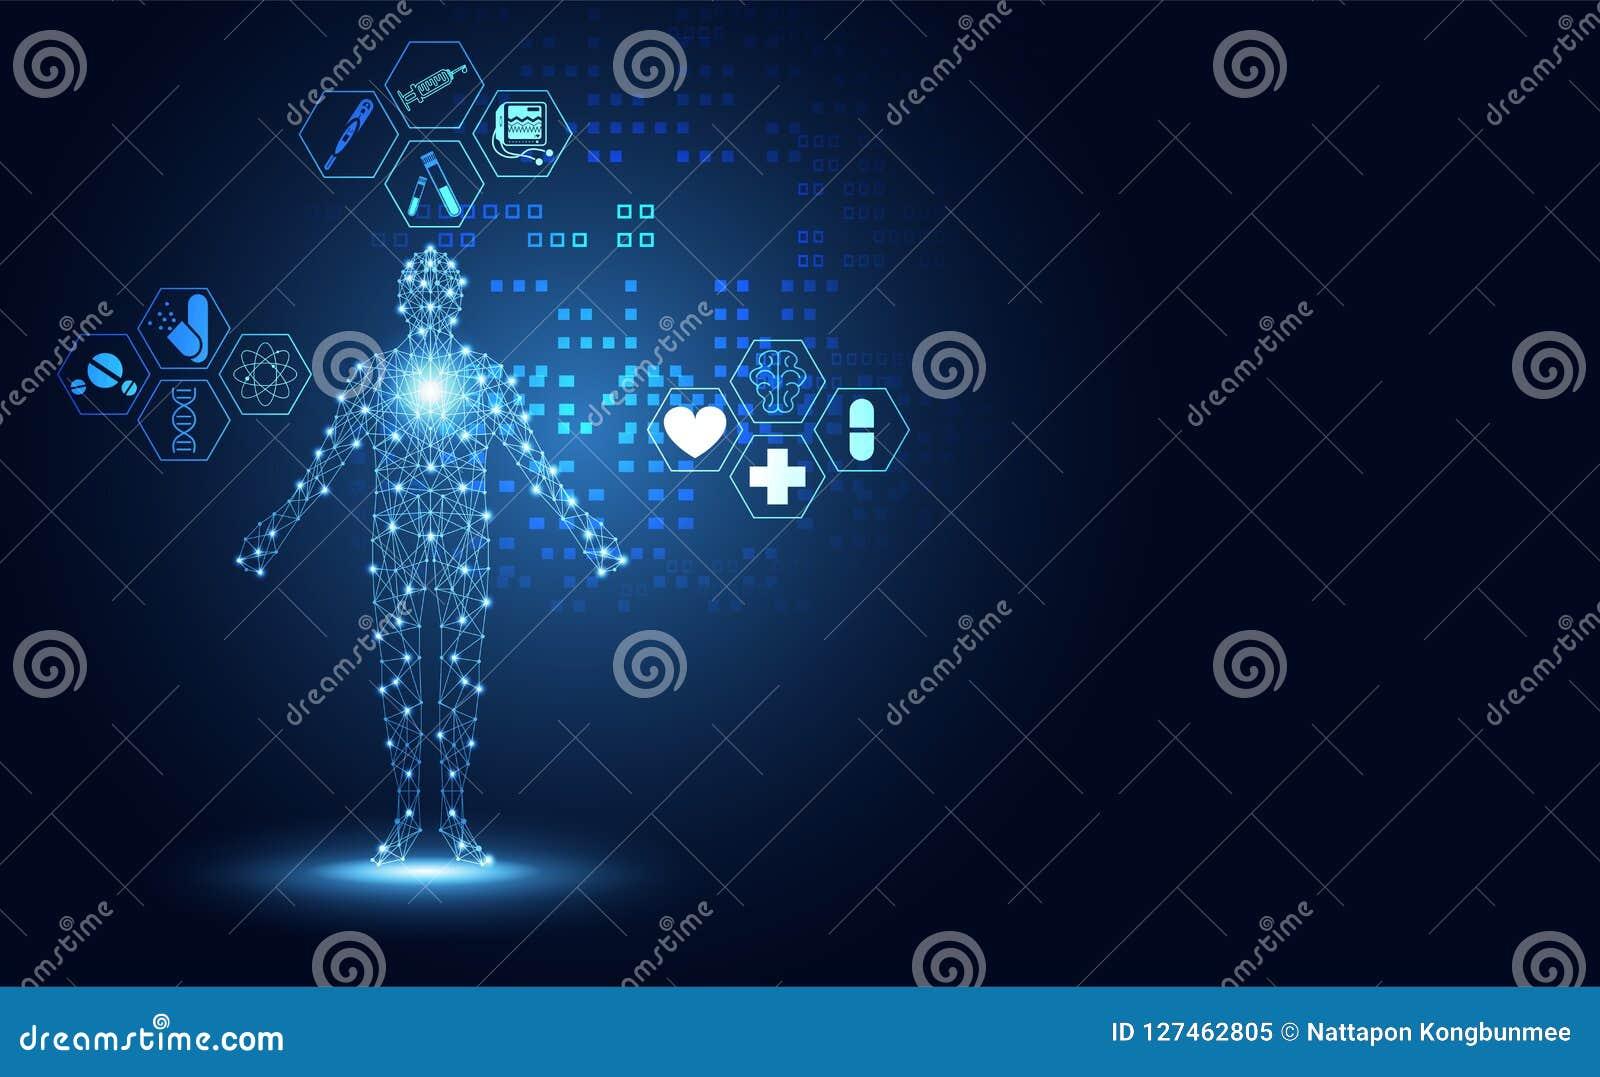 Digital humano do conceito médico digital abstrato da saúde da tecnologia